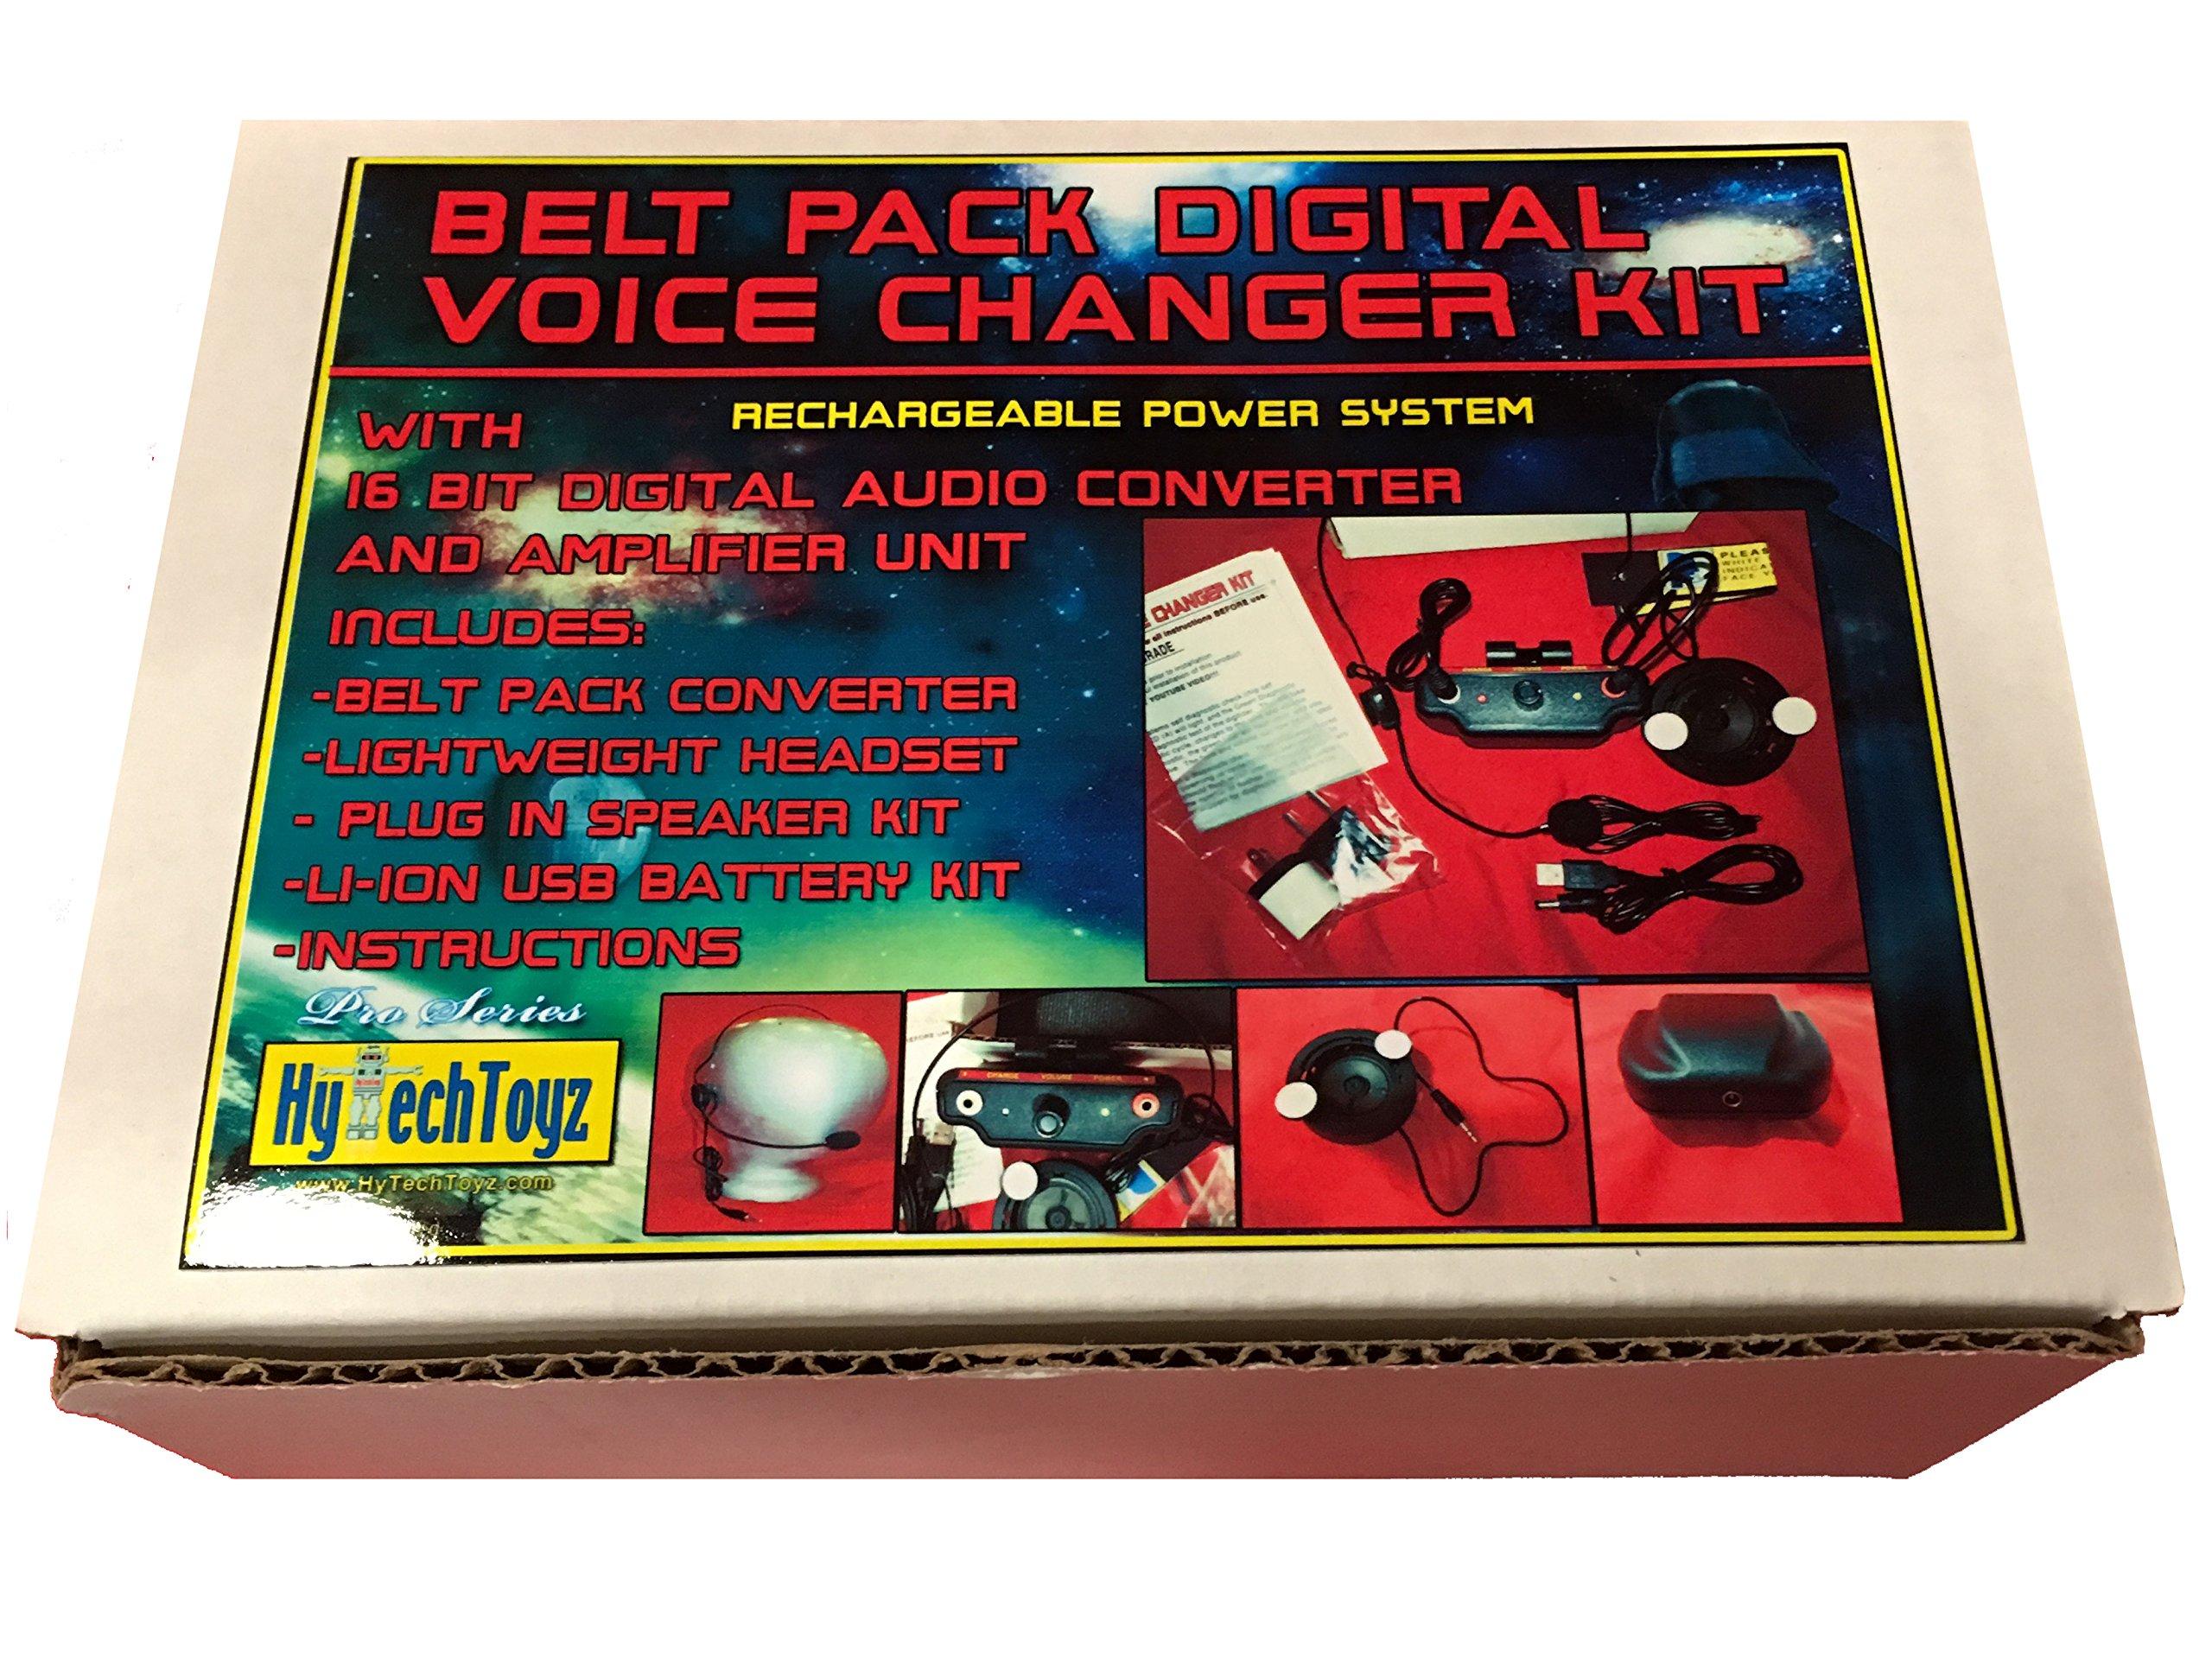 PRO SERIES VOICE CHANGER SYSTEM - SOUND LIKE DARTH VADER